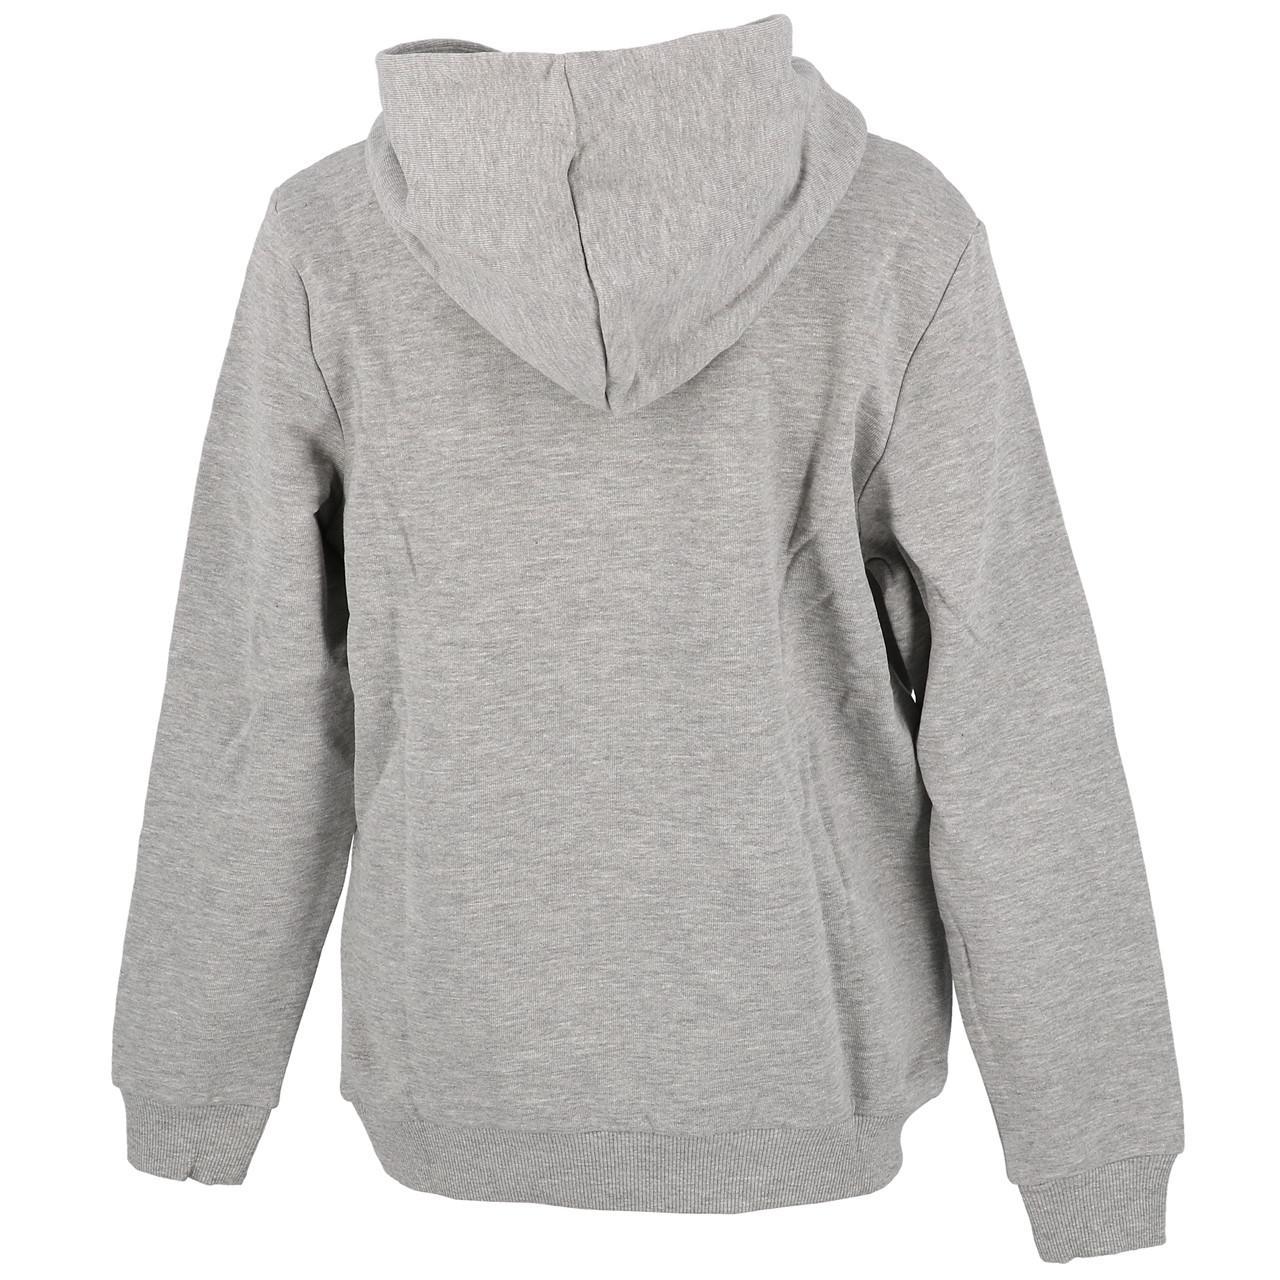 Sweatshirt-Kapuze-Kapuzenpulli-Name-It-Opilo-Grau-Mel-Sw-Jr-Grau-25908-Neu Indexbild 4